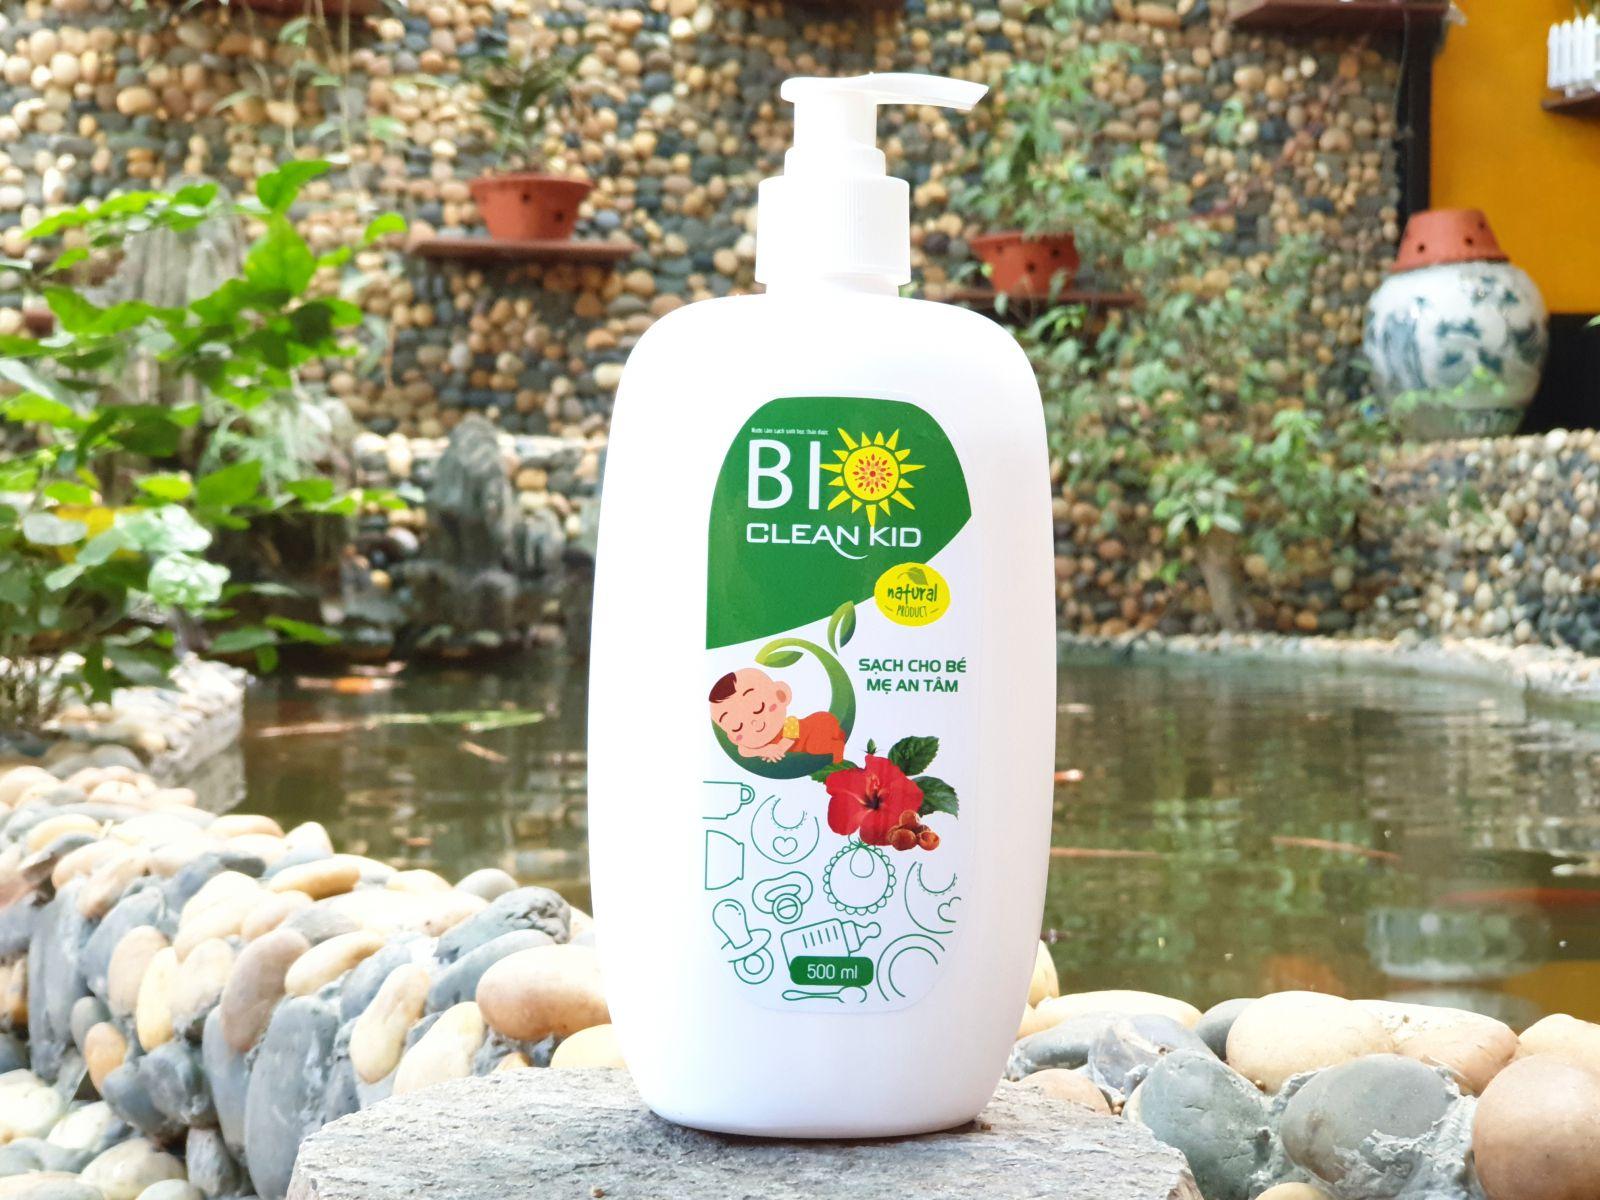 Nước rửa sinh học thảo dược BioClean Kid, chai 500ml